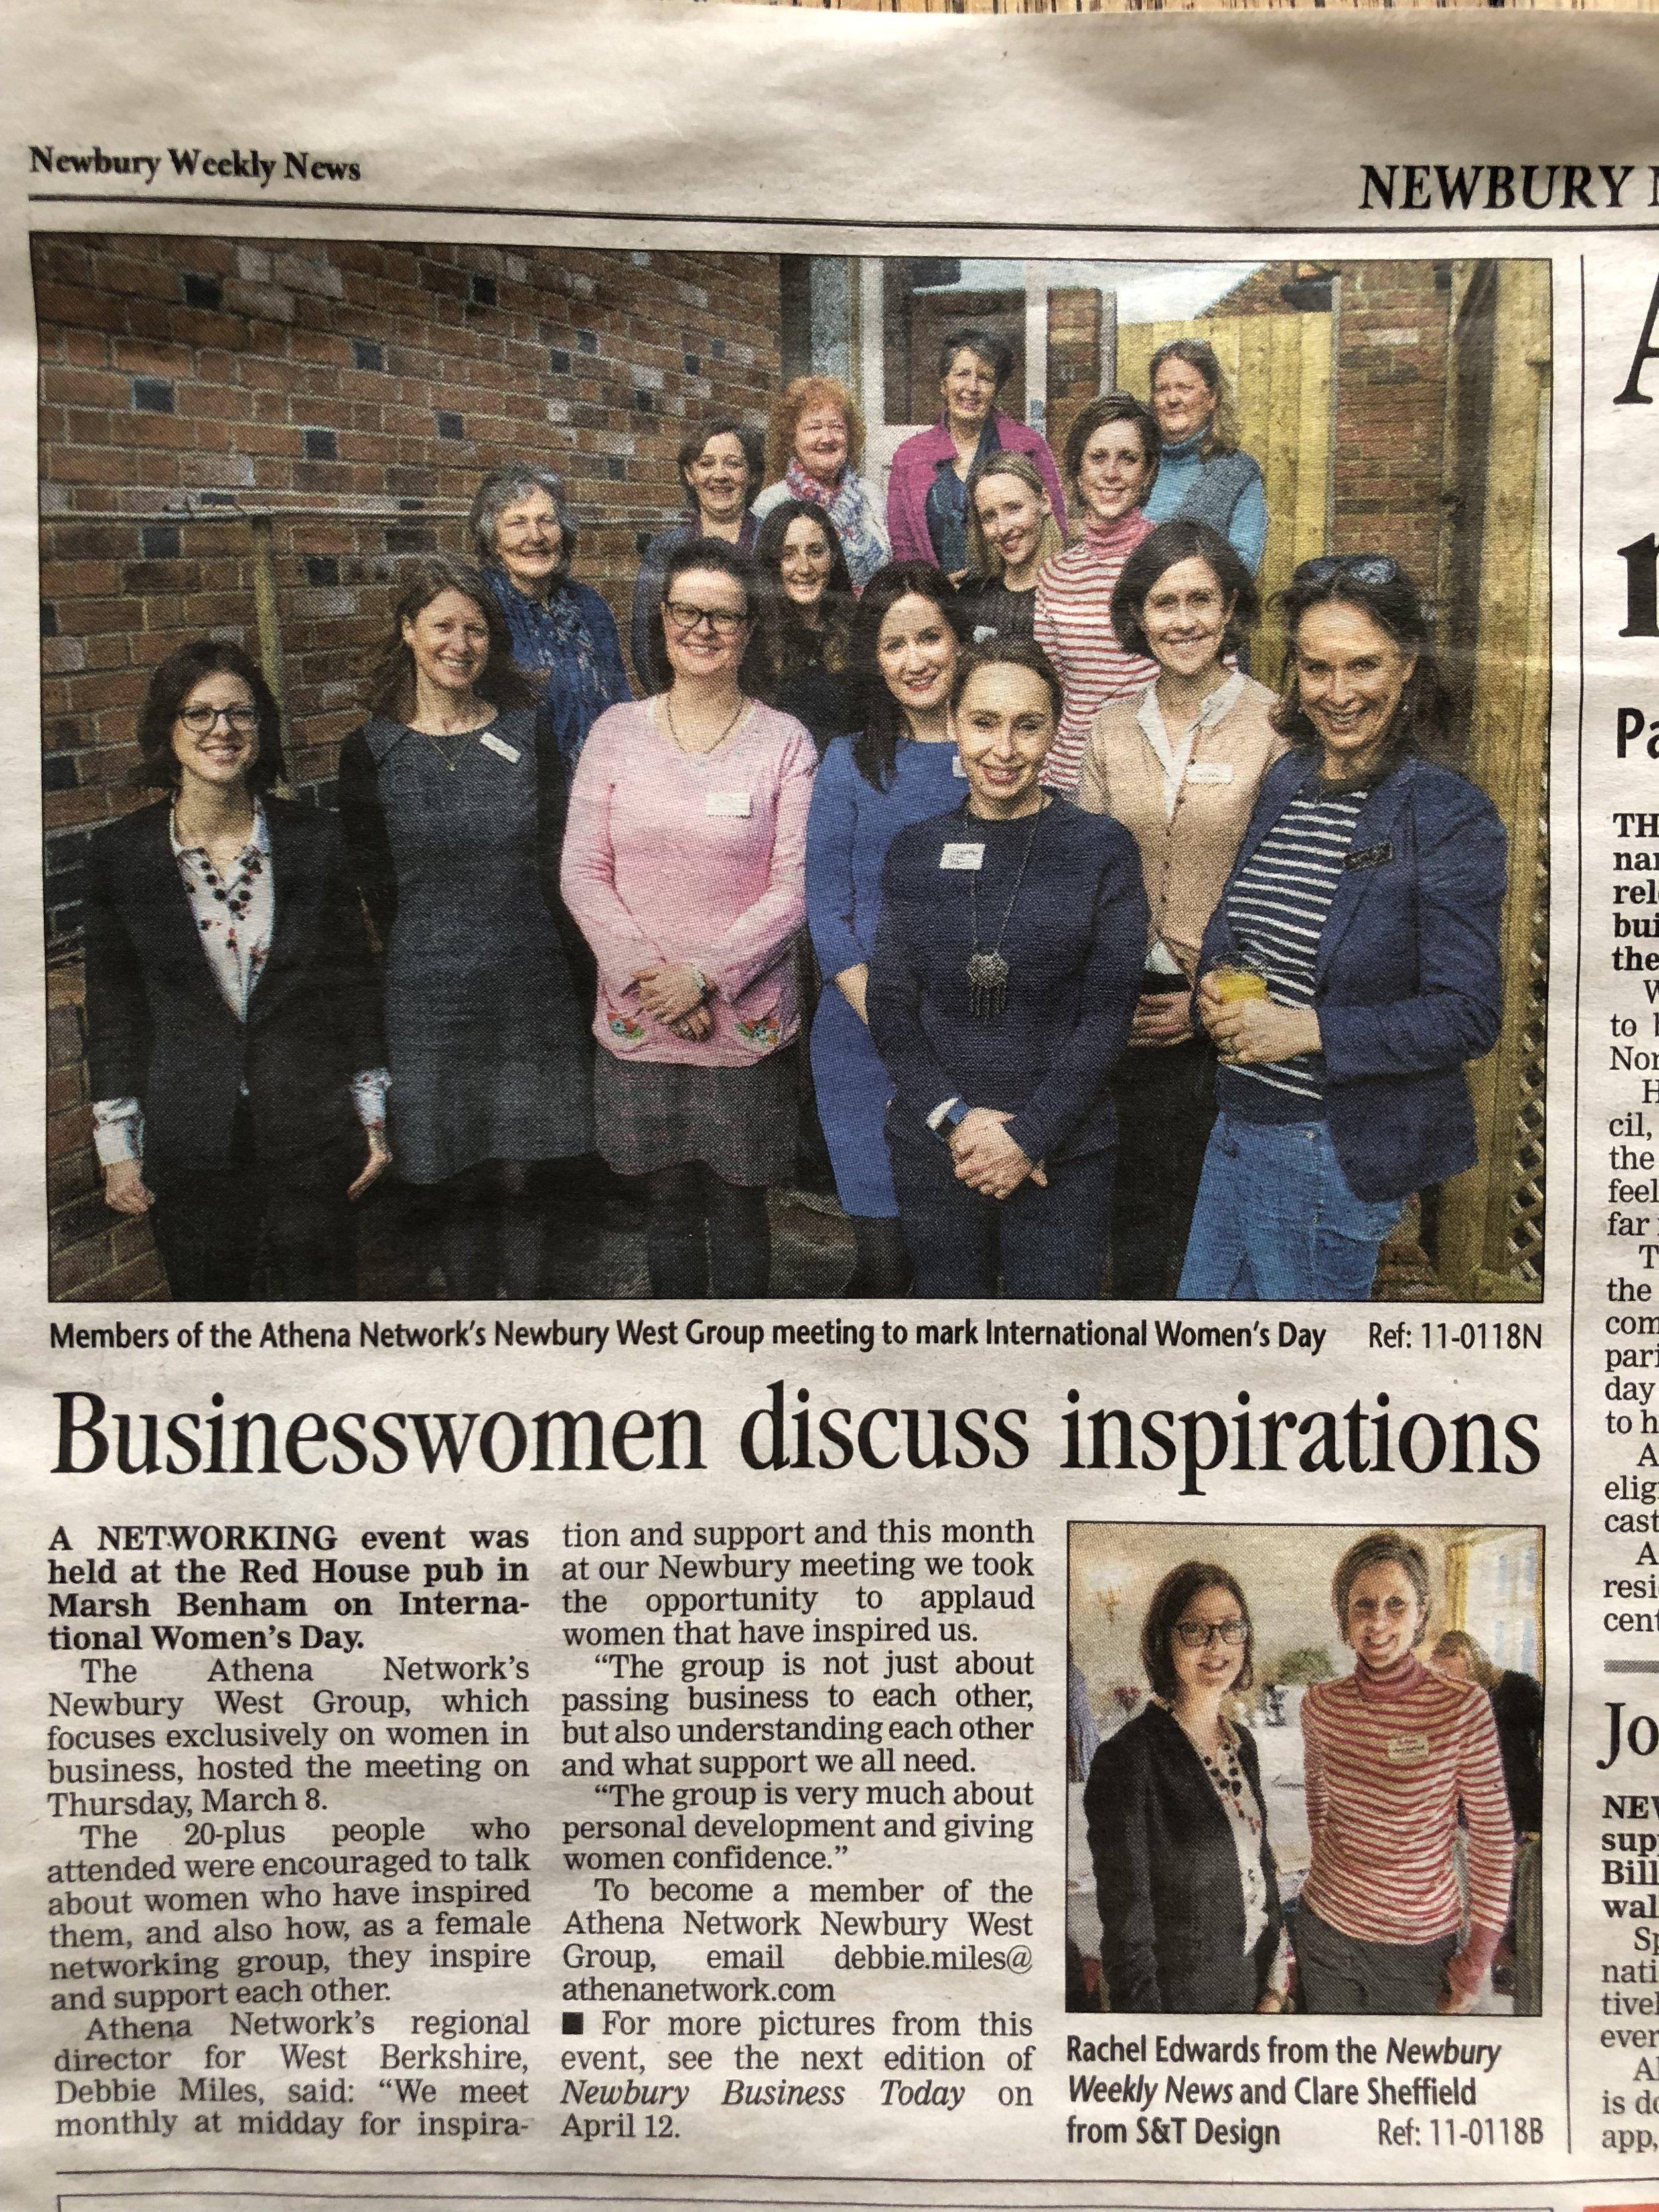 NewburyWeeklyNews_Strong_And_Together_International_Womens_Day.jpg